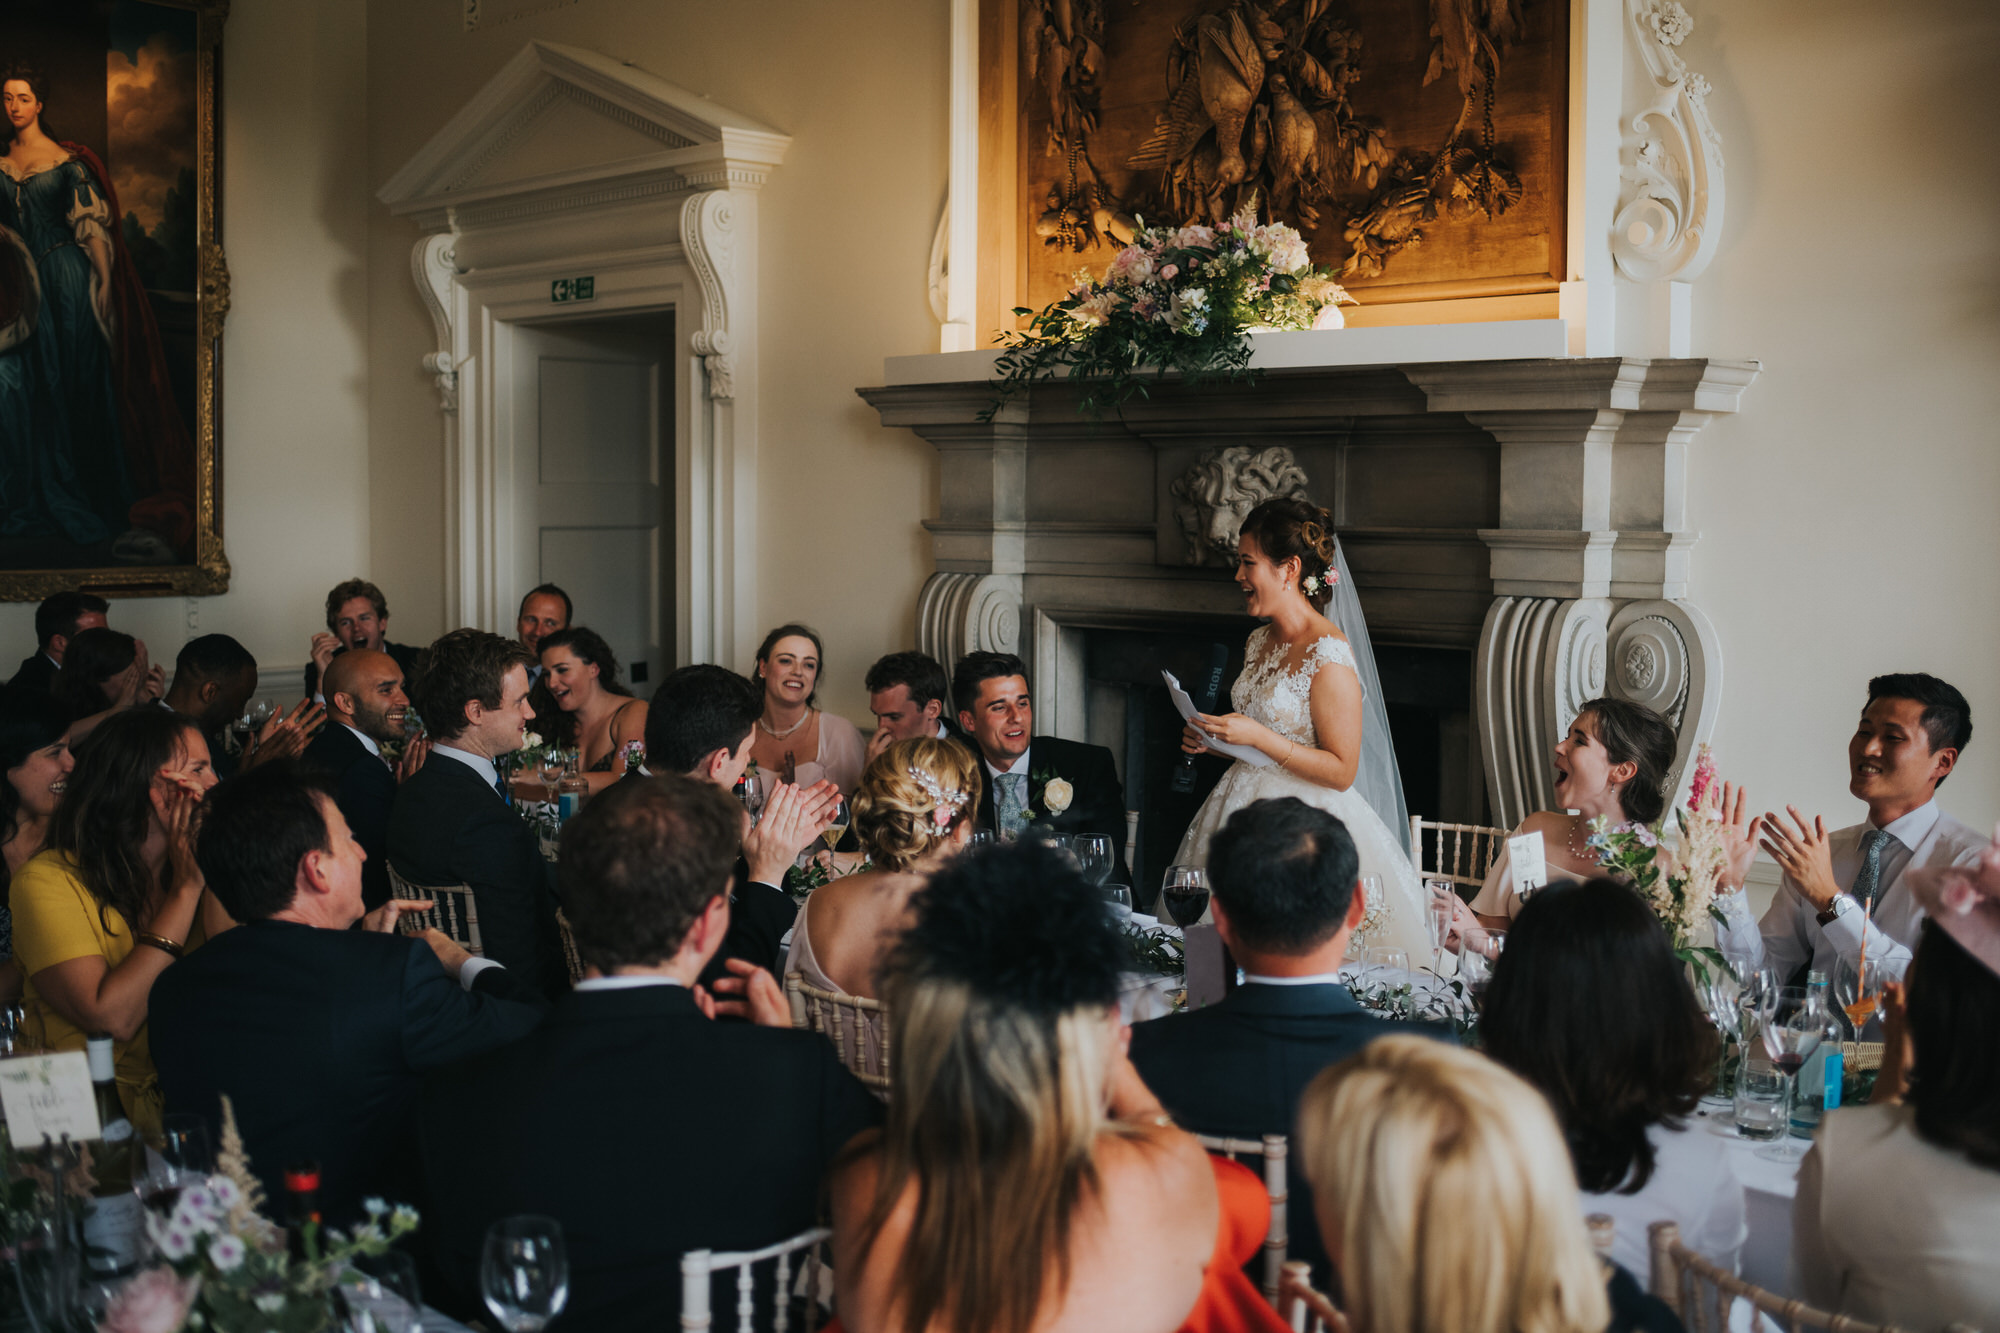 Kirtlington park wedding speeches